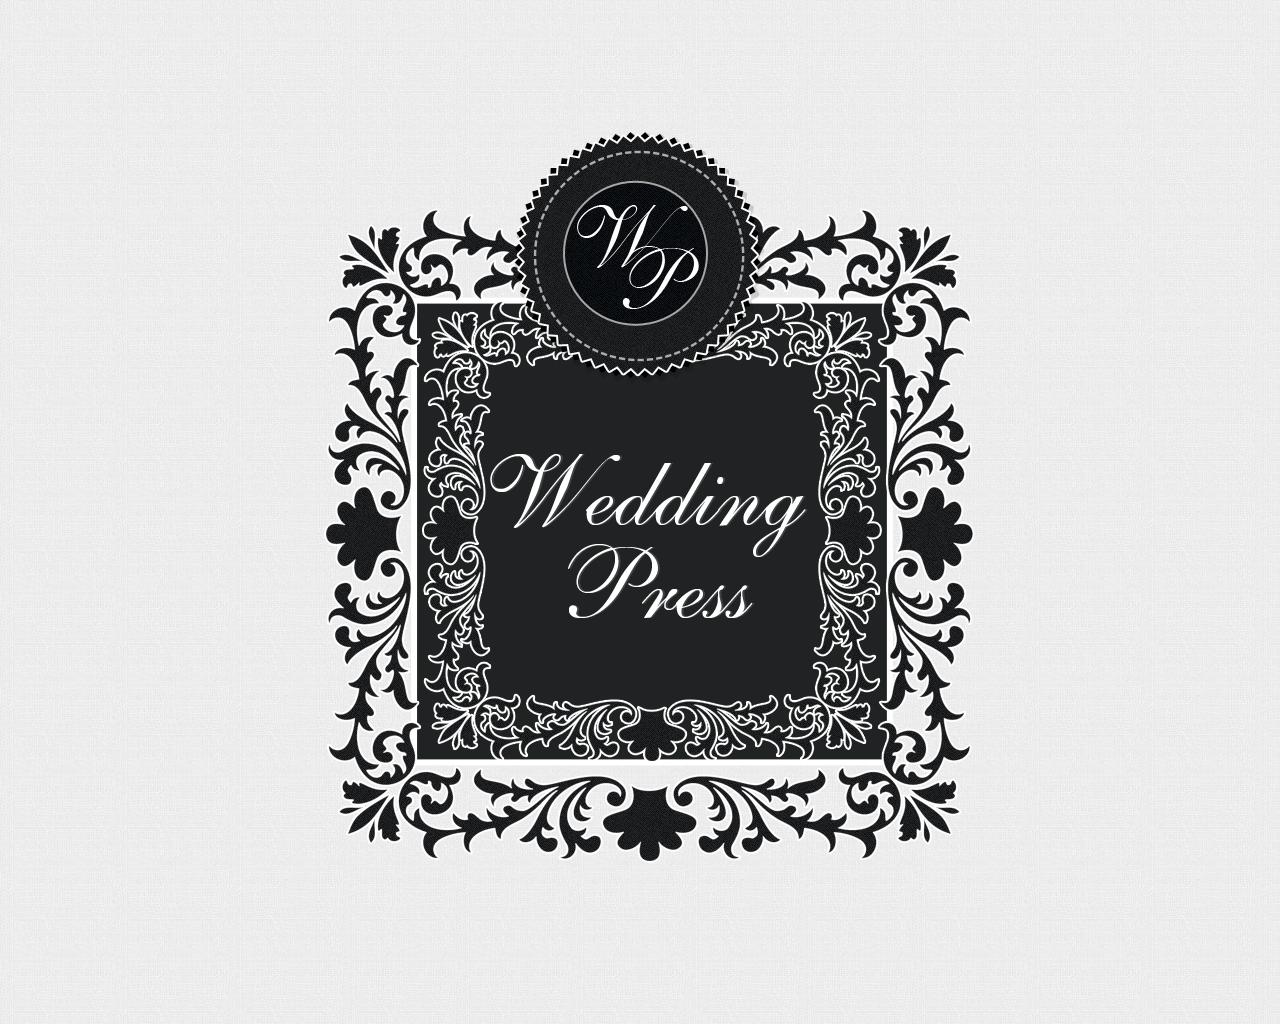 Logo Design by Bobby Yoga P - Entry No. 29 in the Logo Design Contest Wedding Writes Logo Design.